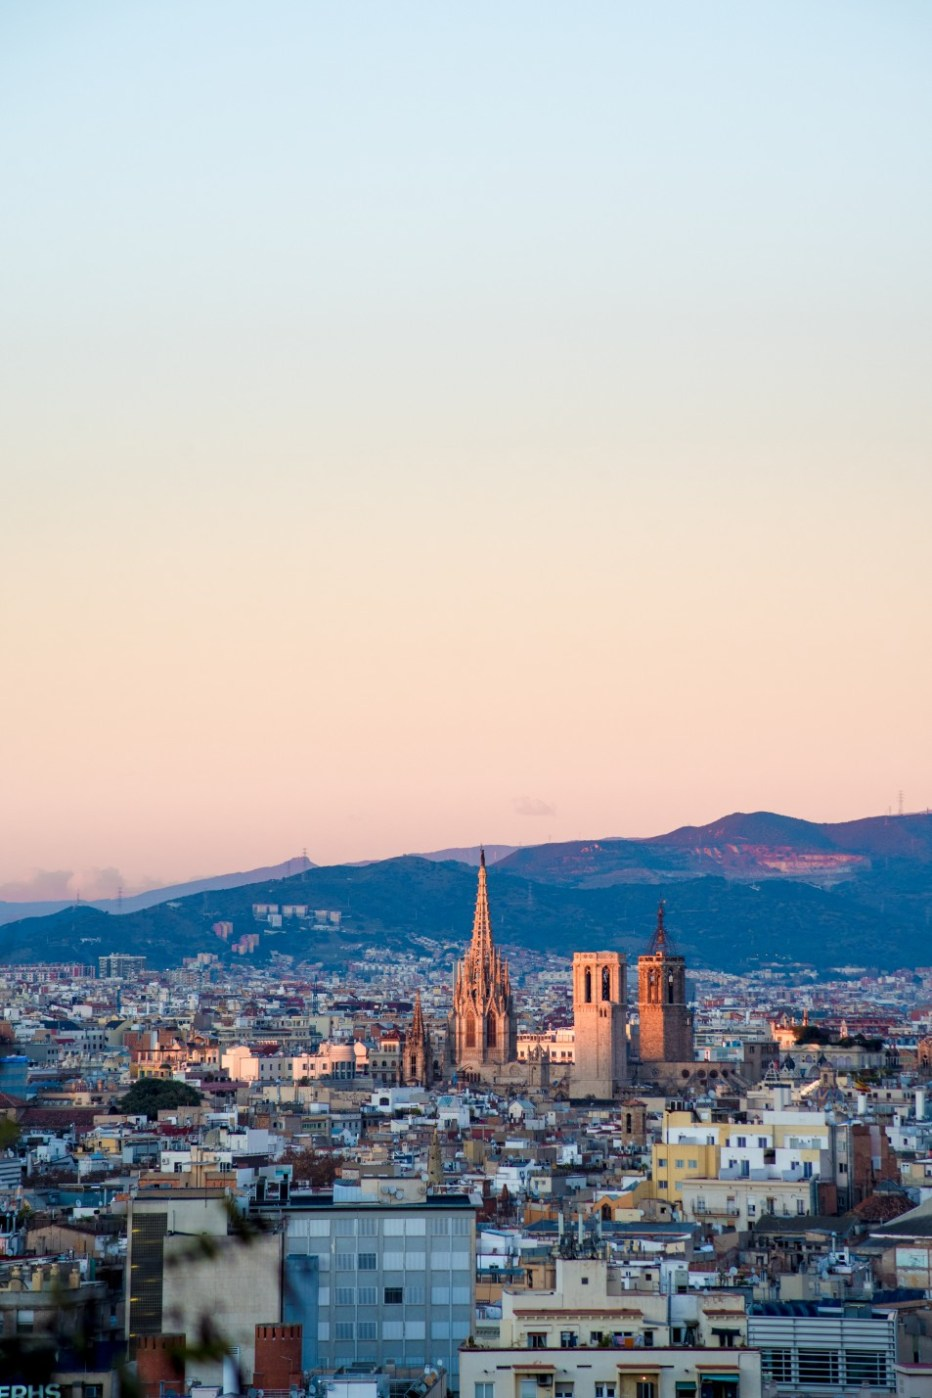 Barcelona Cathedral at dusk